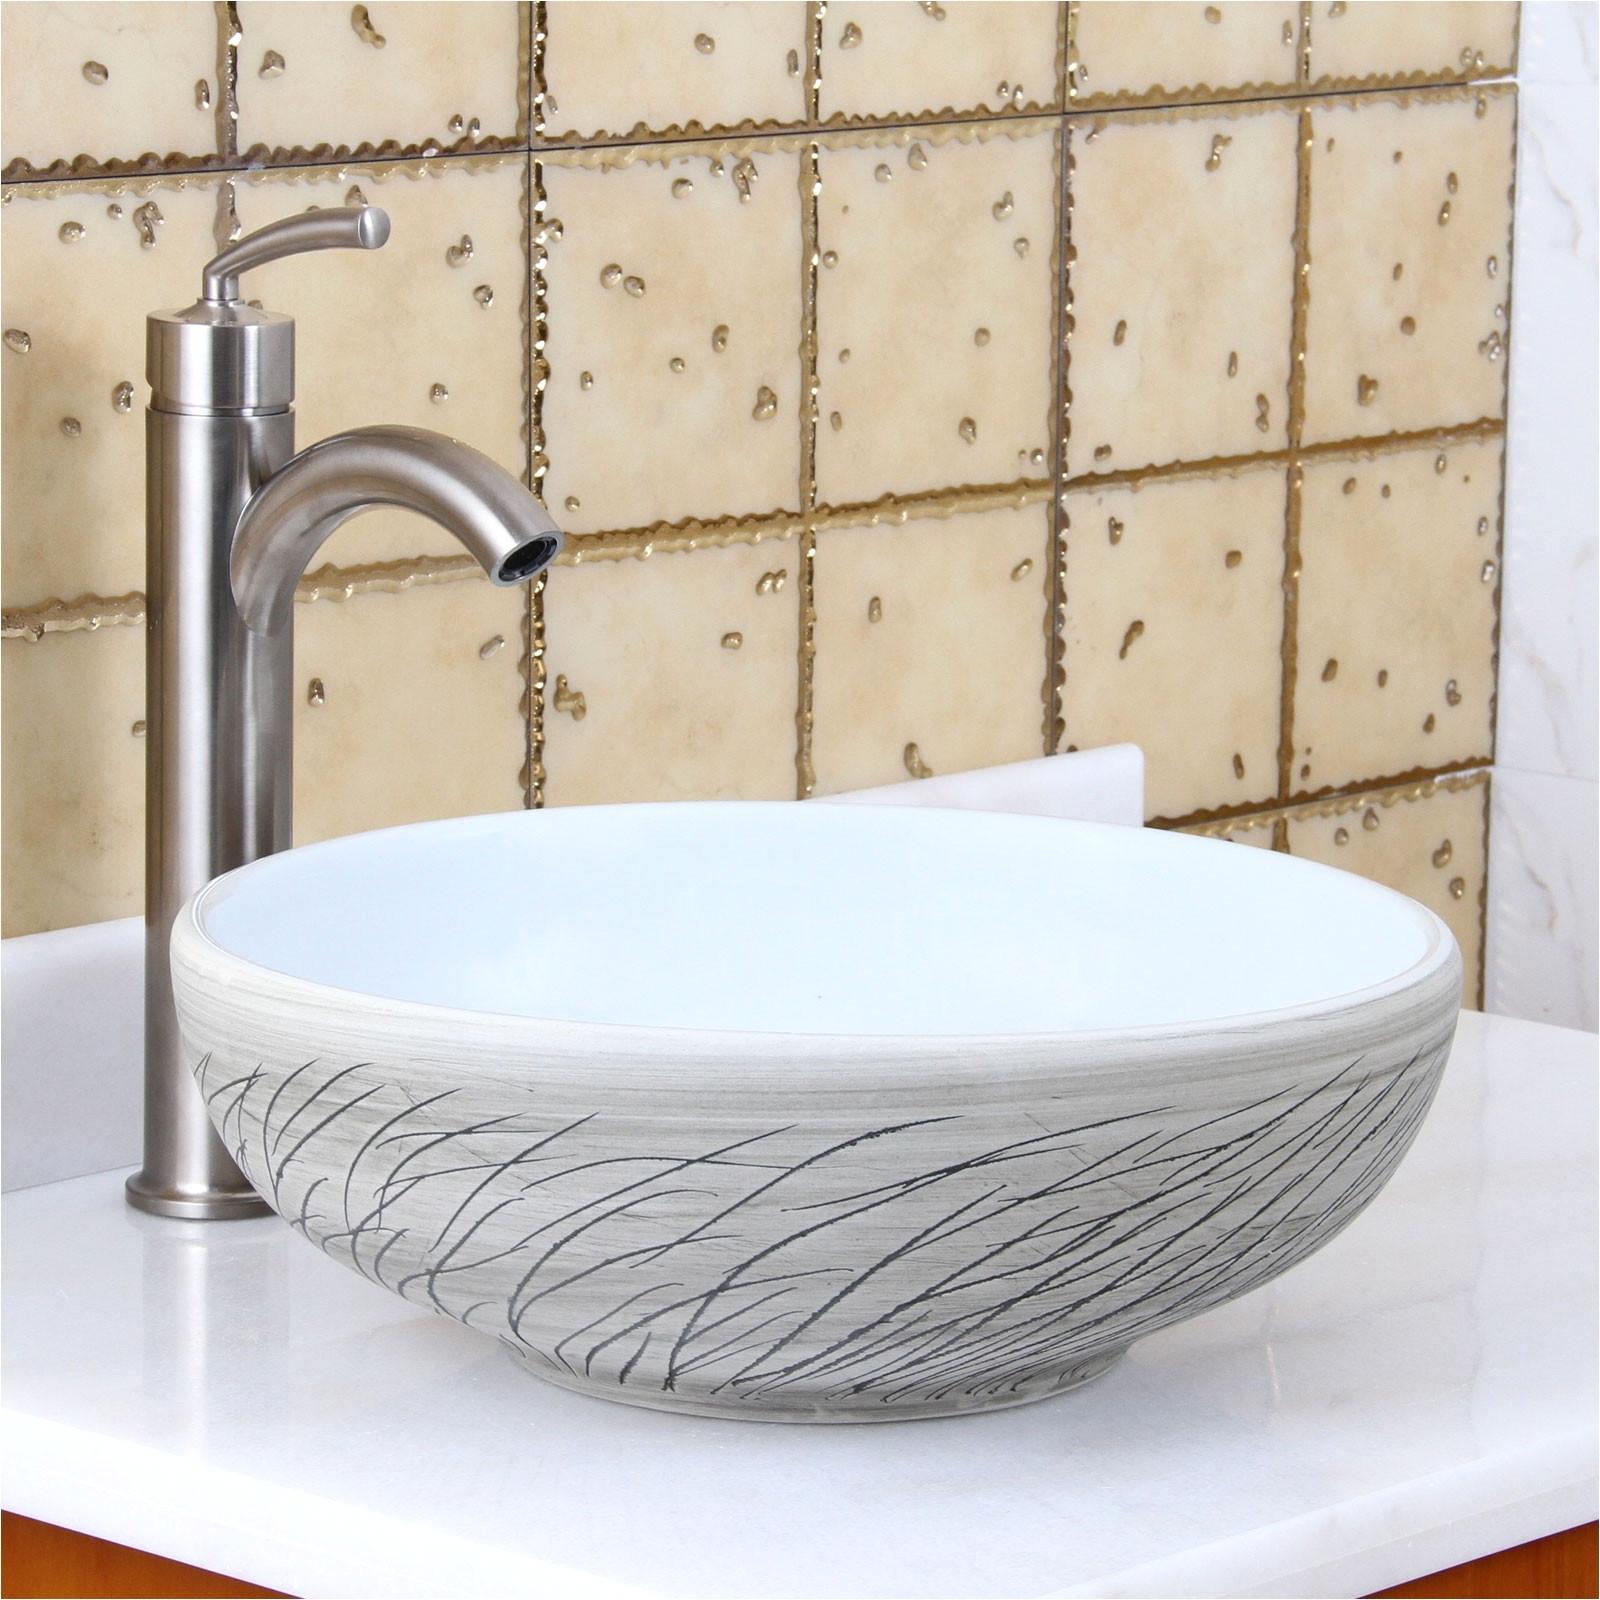 Luxury Bathroom Shower Light New H Sink Install Bathroom I 0d Design Also Pink Exterior Decor